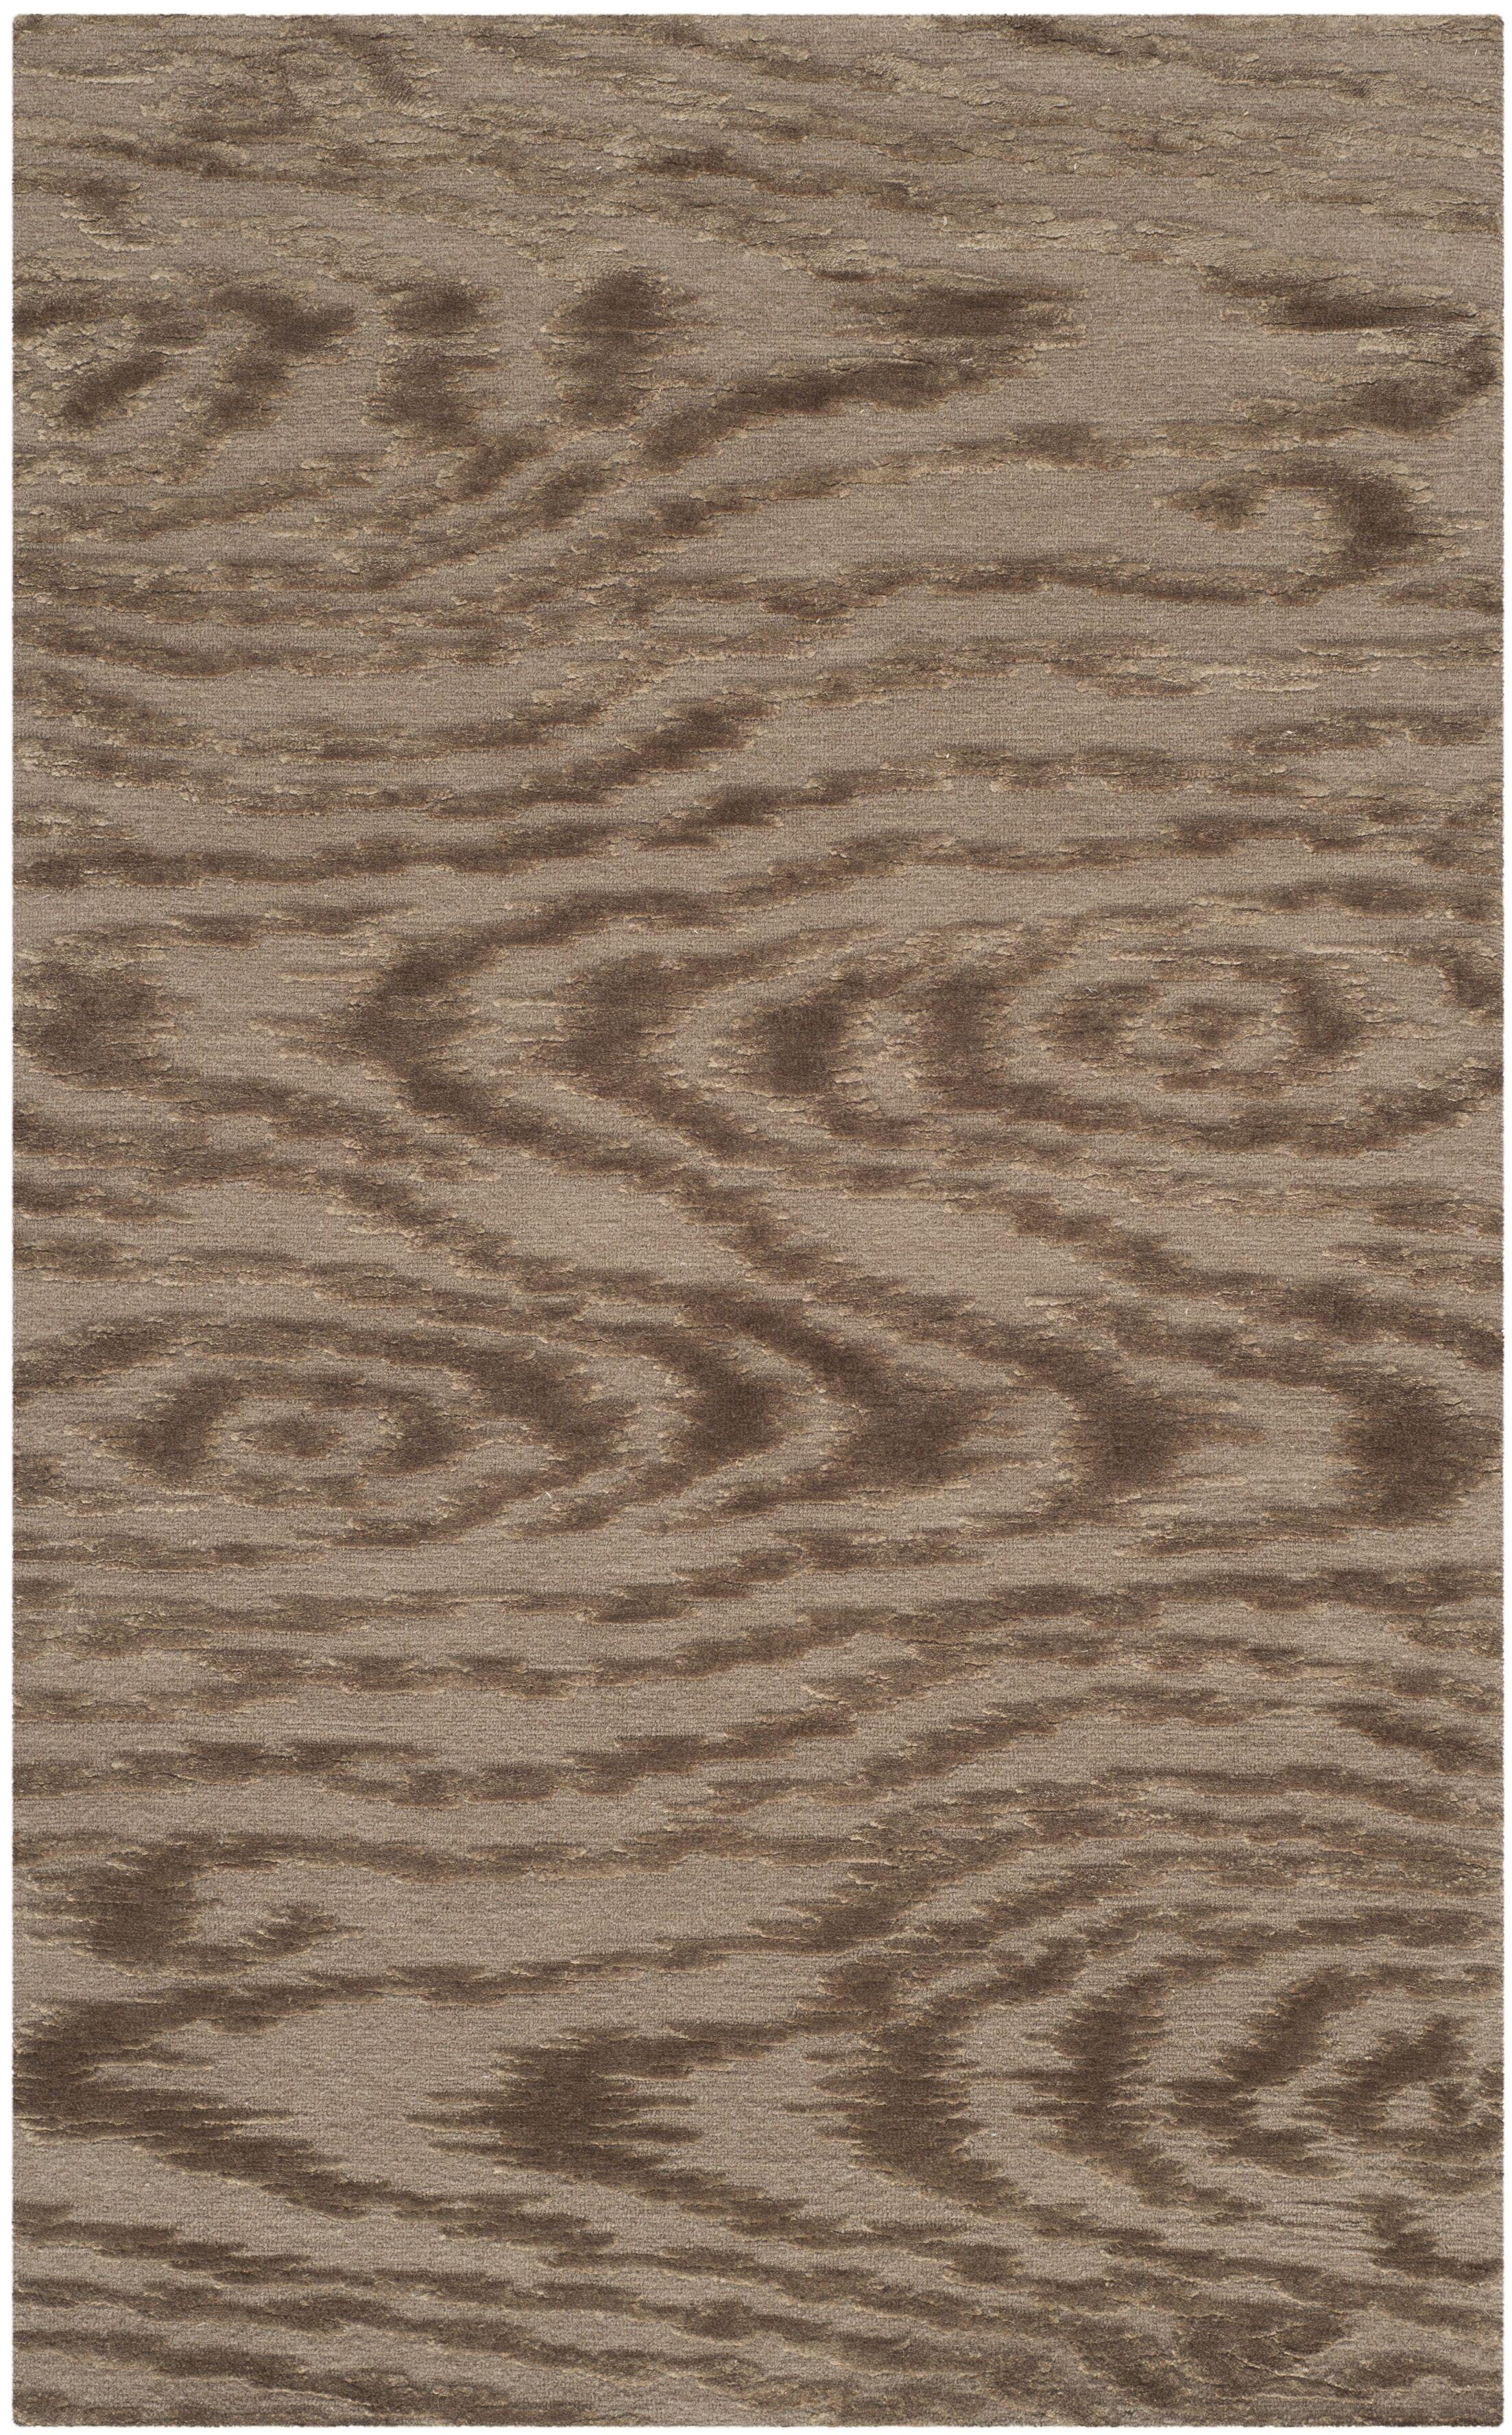 Martha Stewart Faux Bois Truffle Area Rug Rug Size: Rectangle 5'6